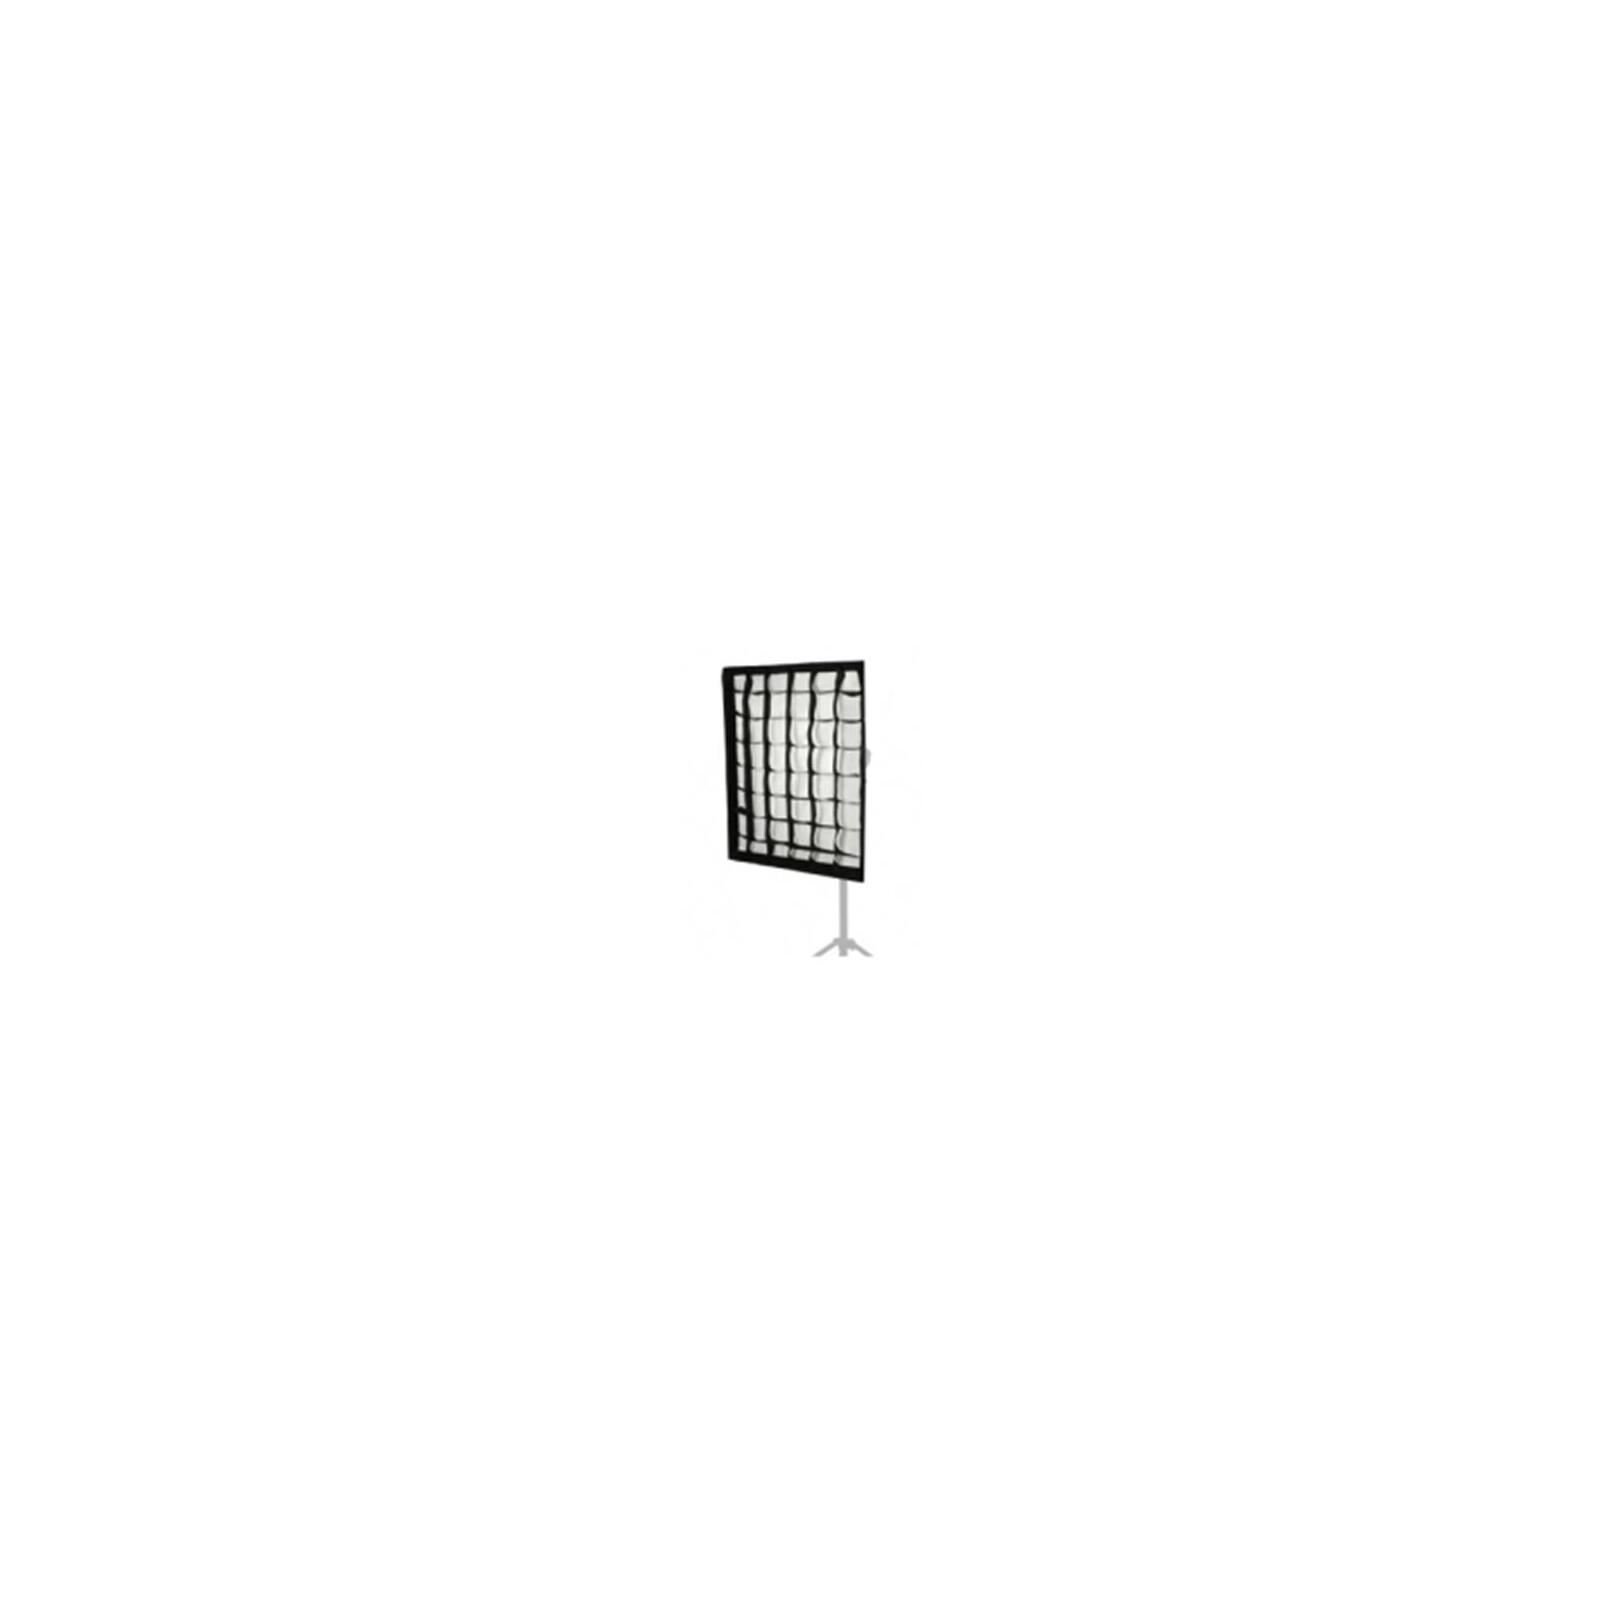 walimex pro Softbox PLUS 60x80cm für Elinchrom